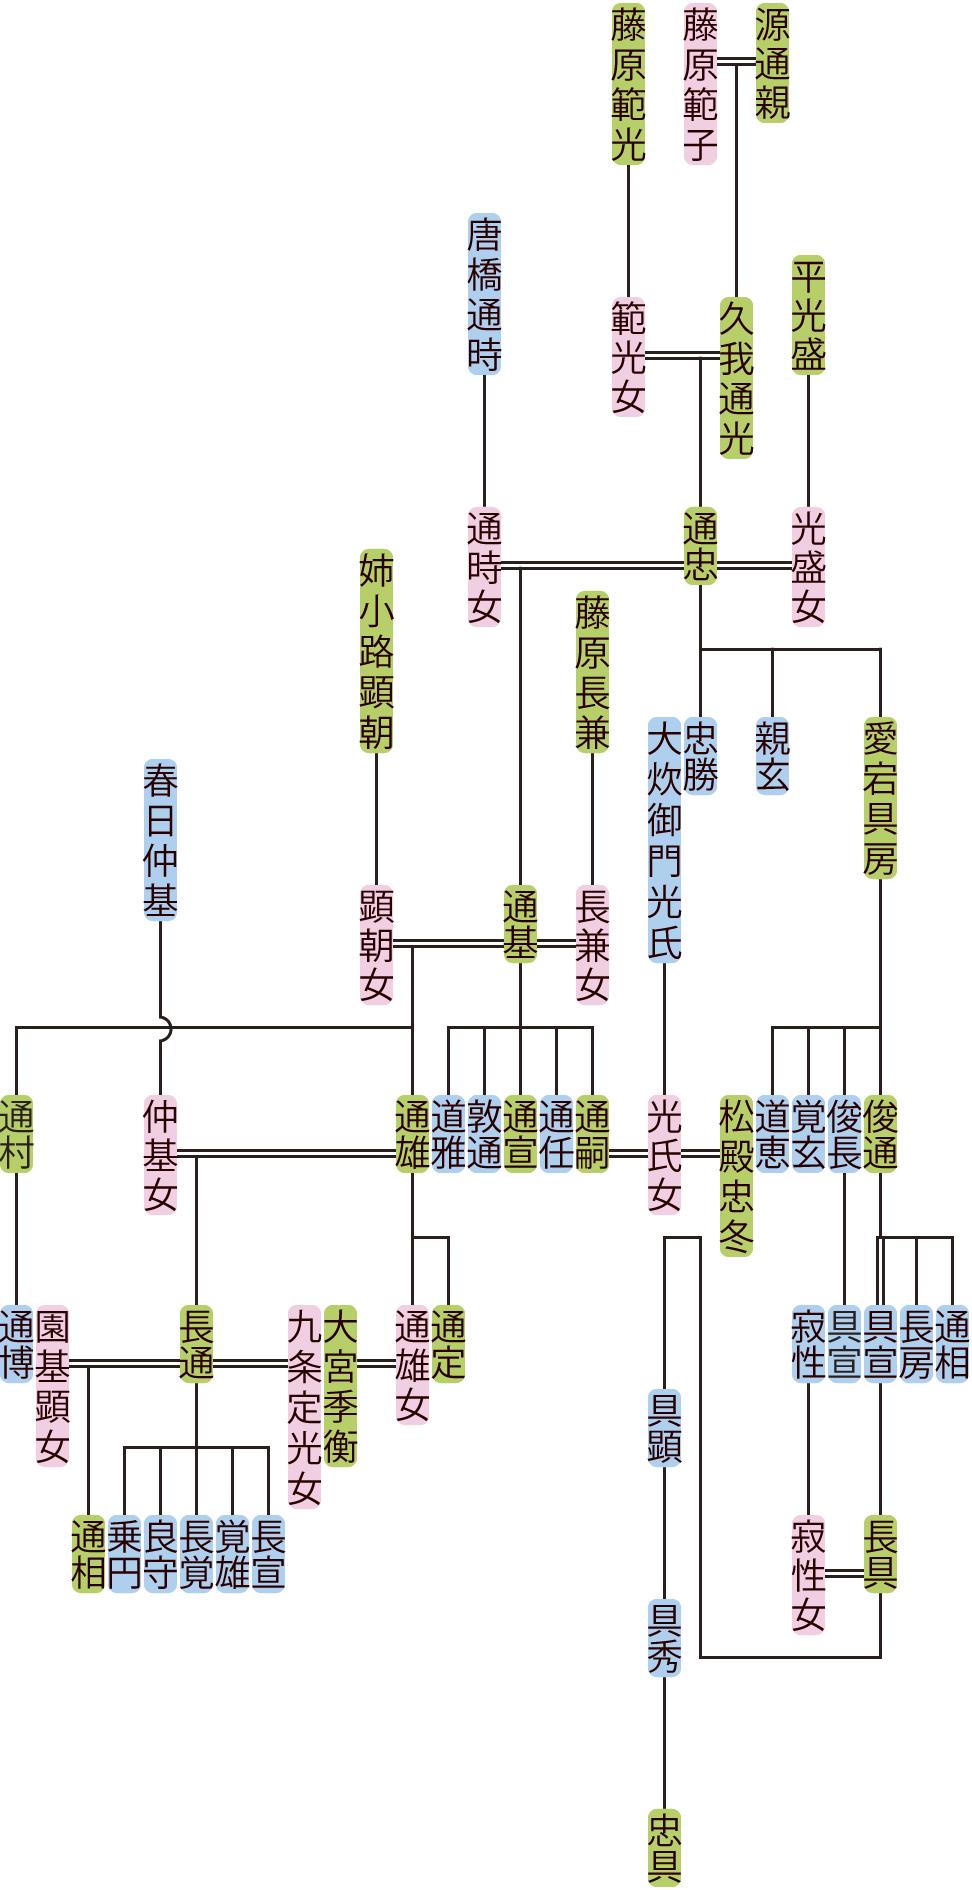 久我通忠~通雄の系図